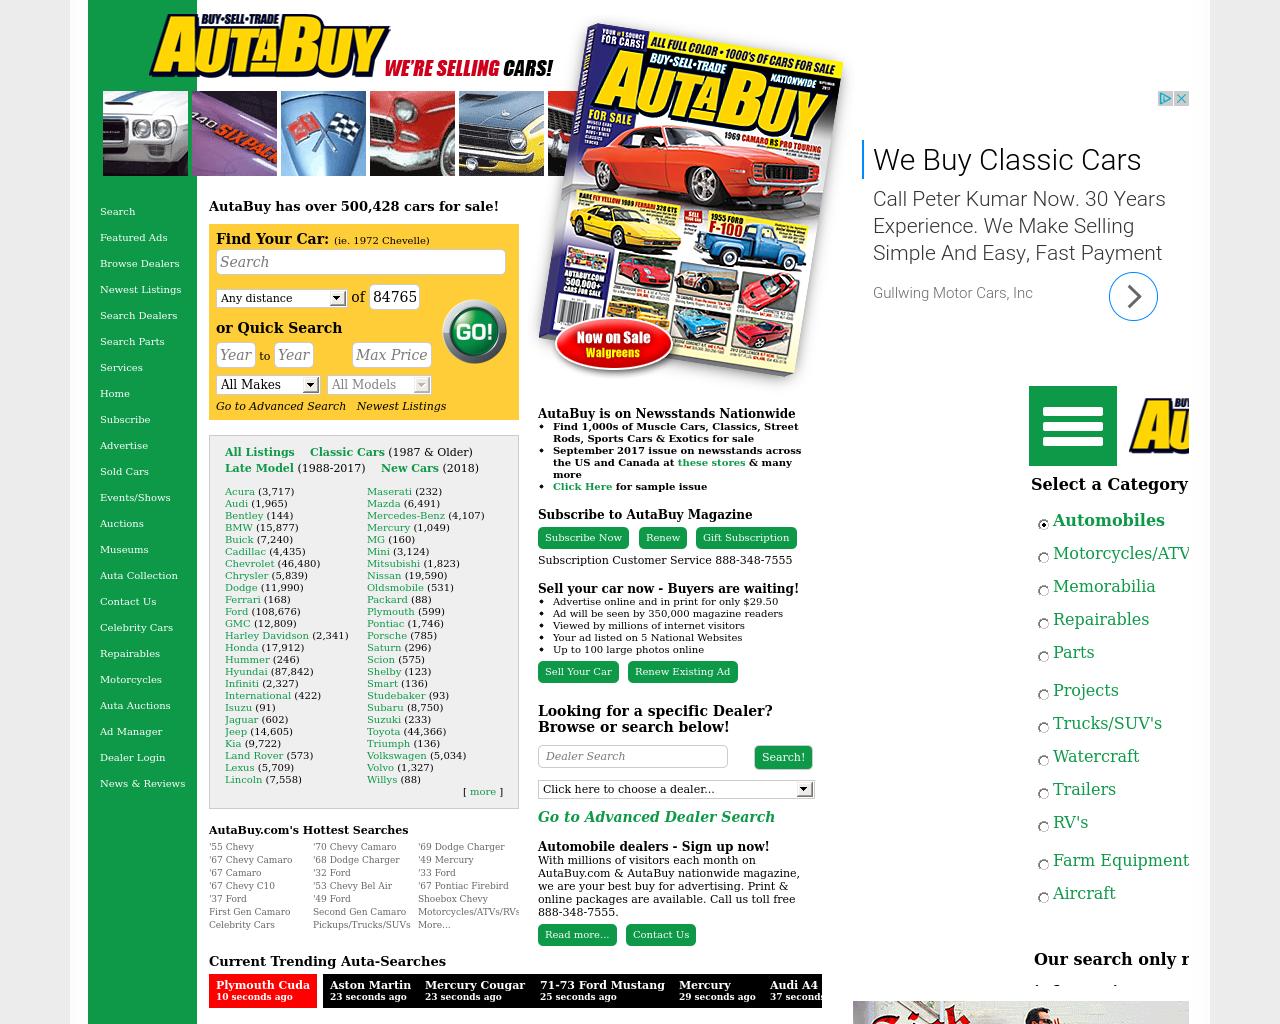 Autabuy-Advertising-Reviews-Pricing